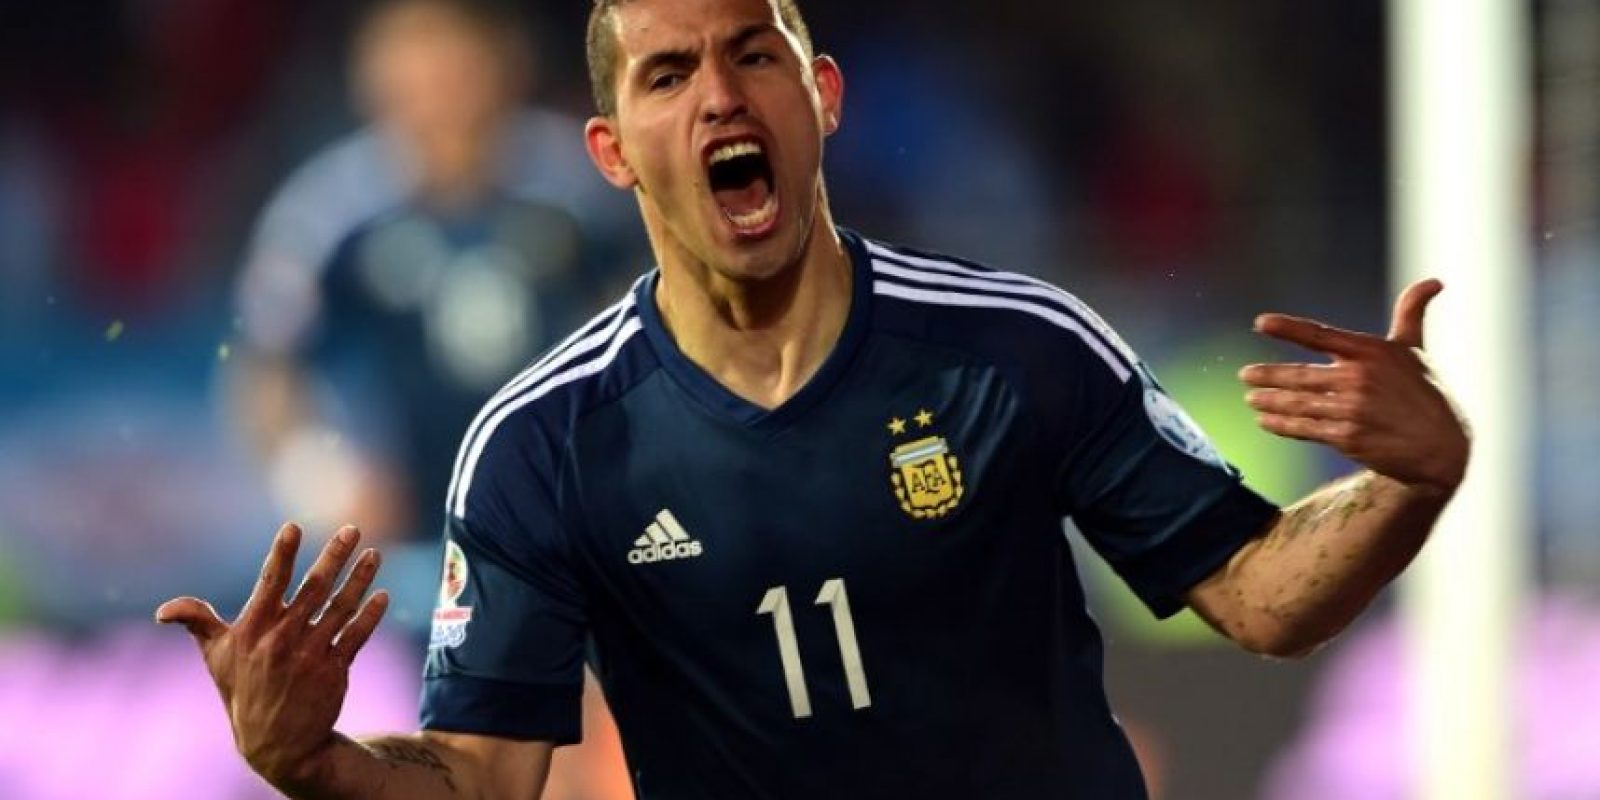 Le marcó goles claves a Paraguay y Uruguay Foto:Getty Images